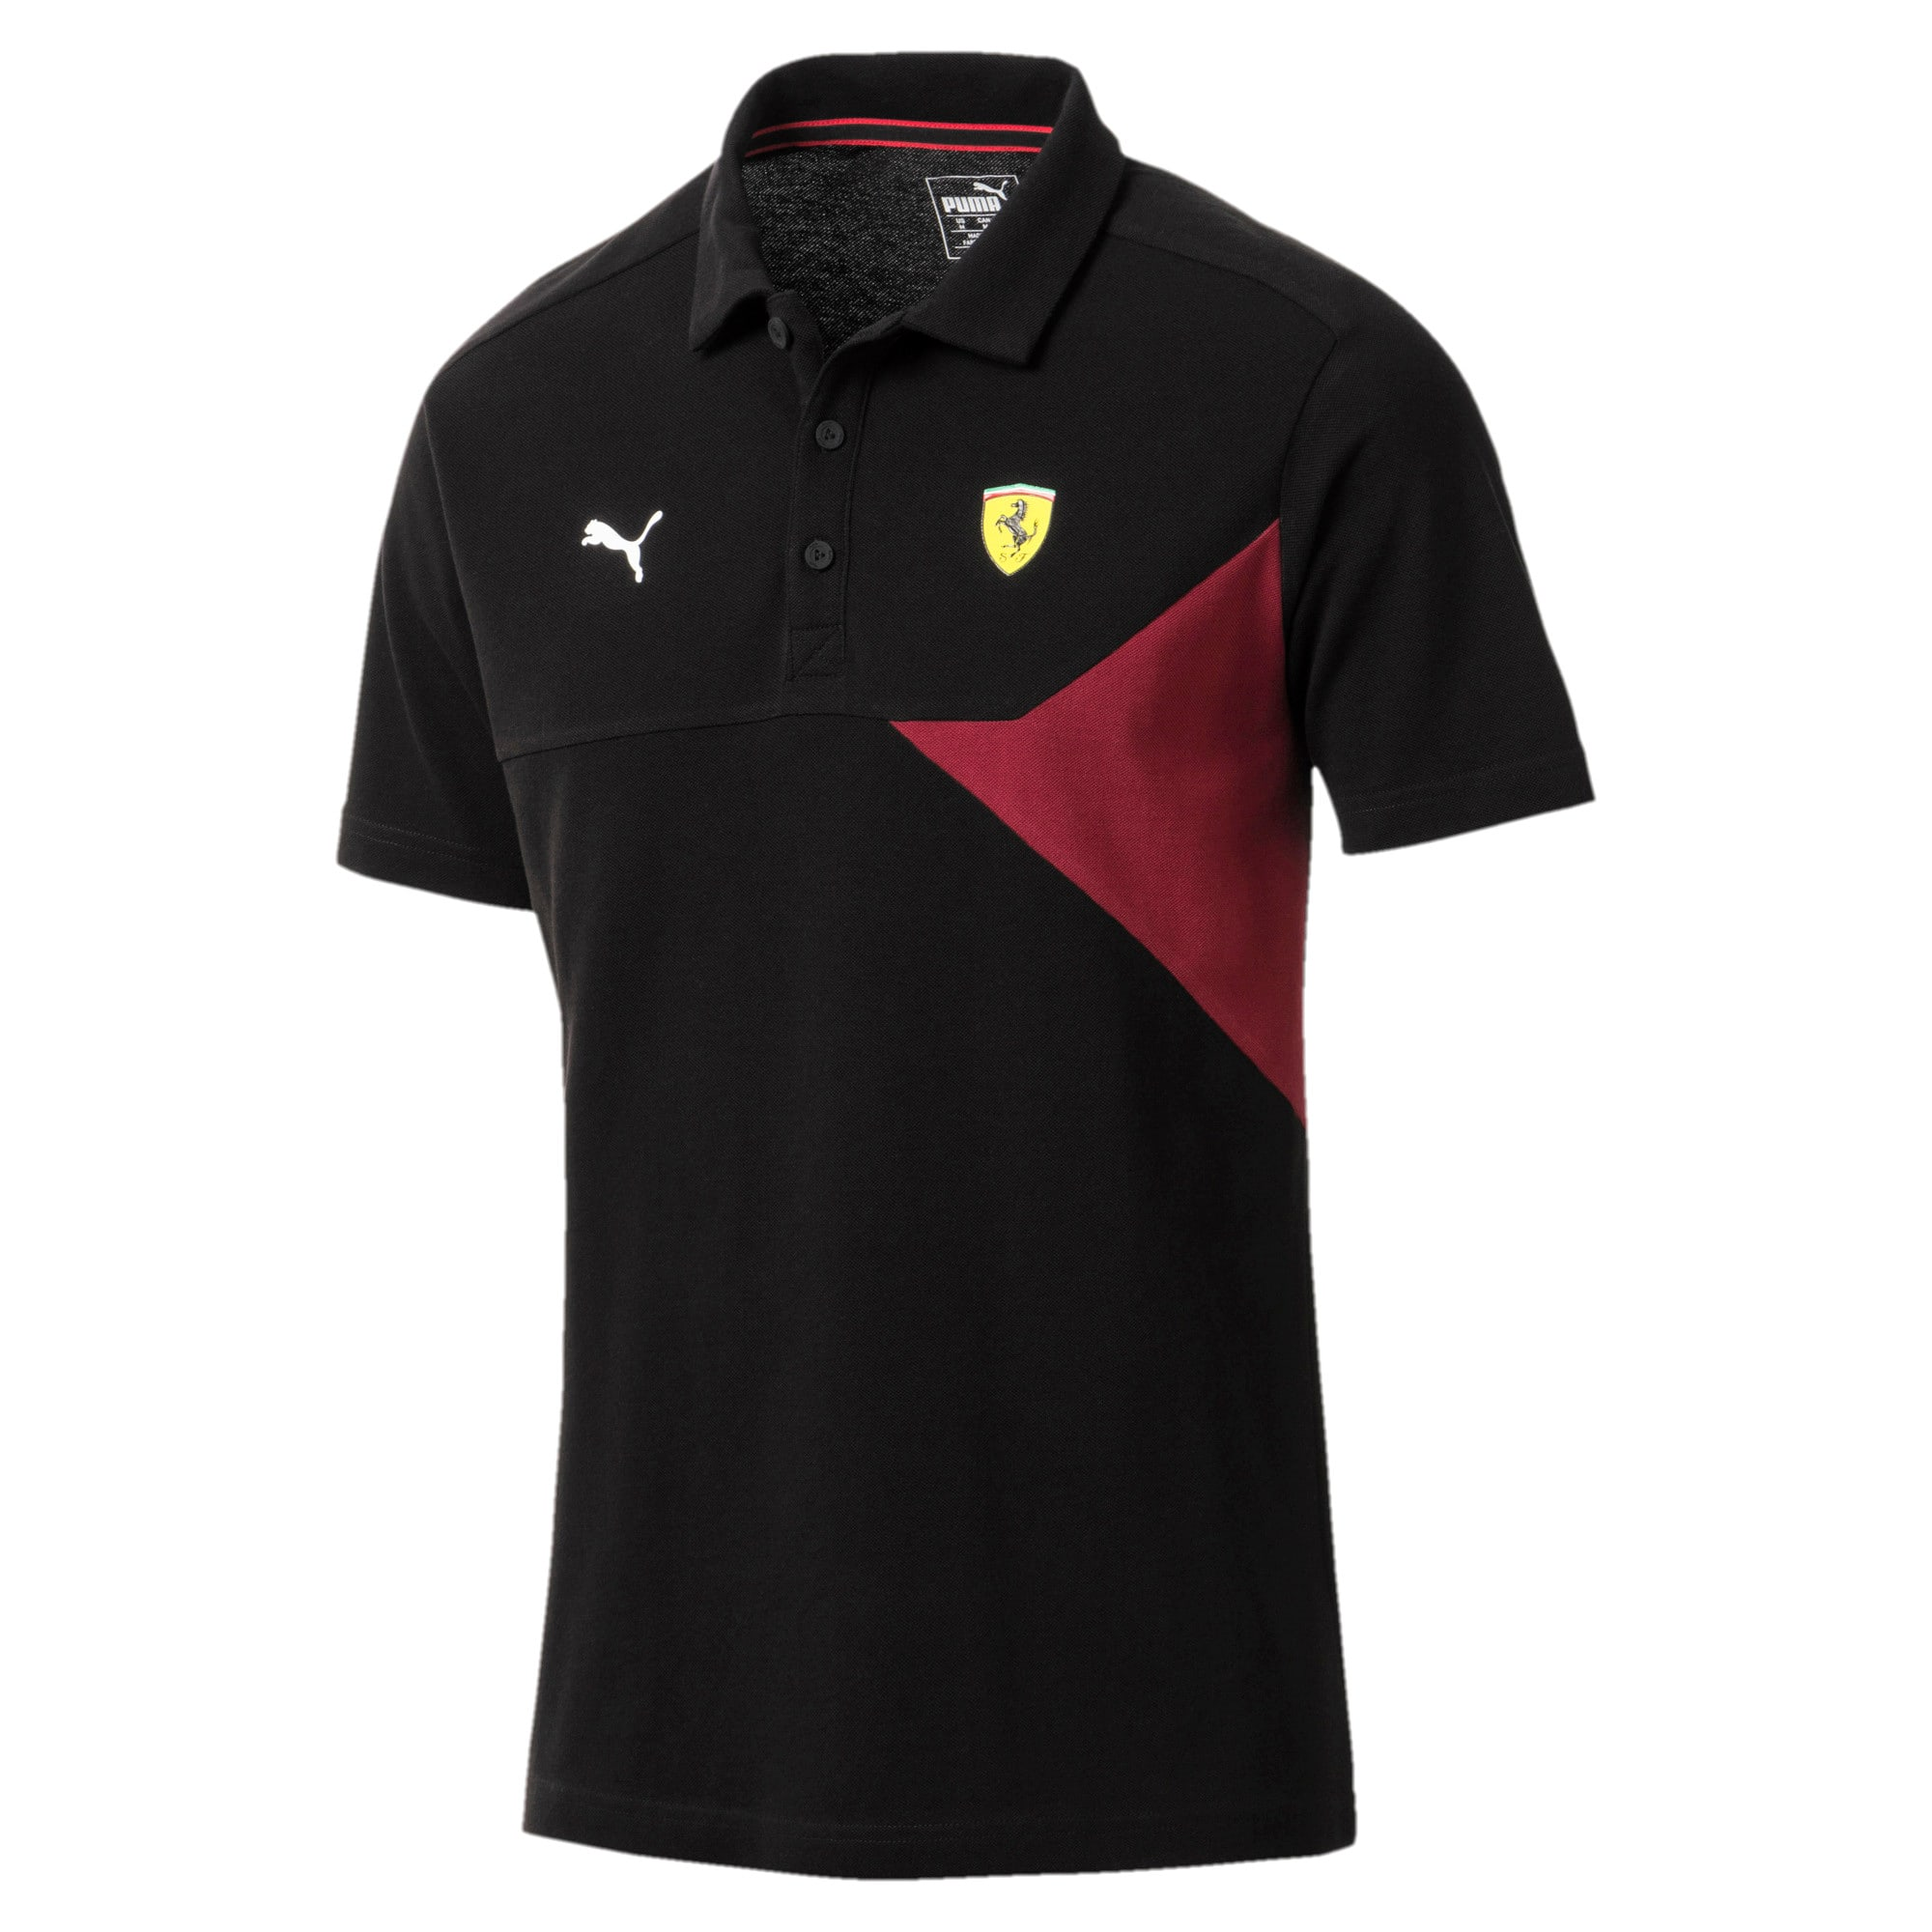 Thumbnail 1 of Scuderia Ferrari Men's Polo, Puma Black, medium